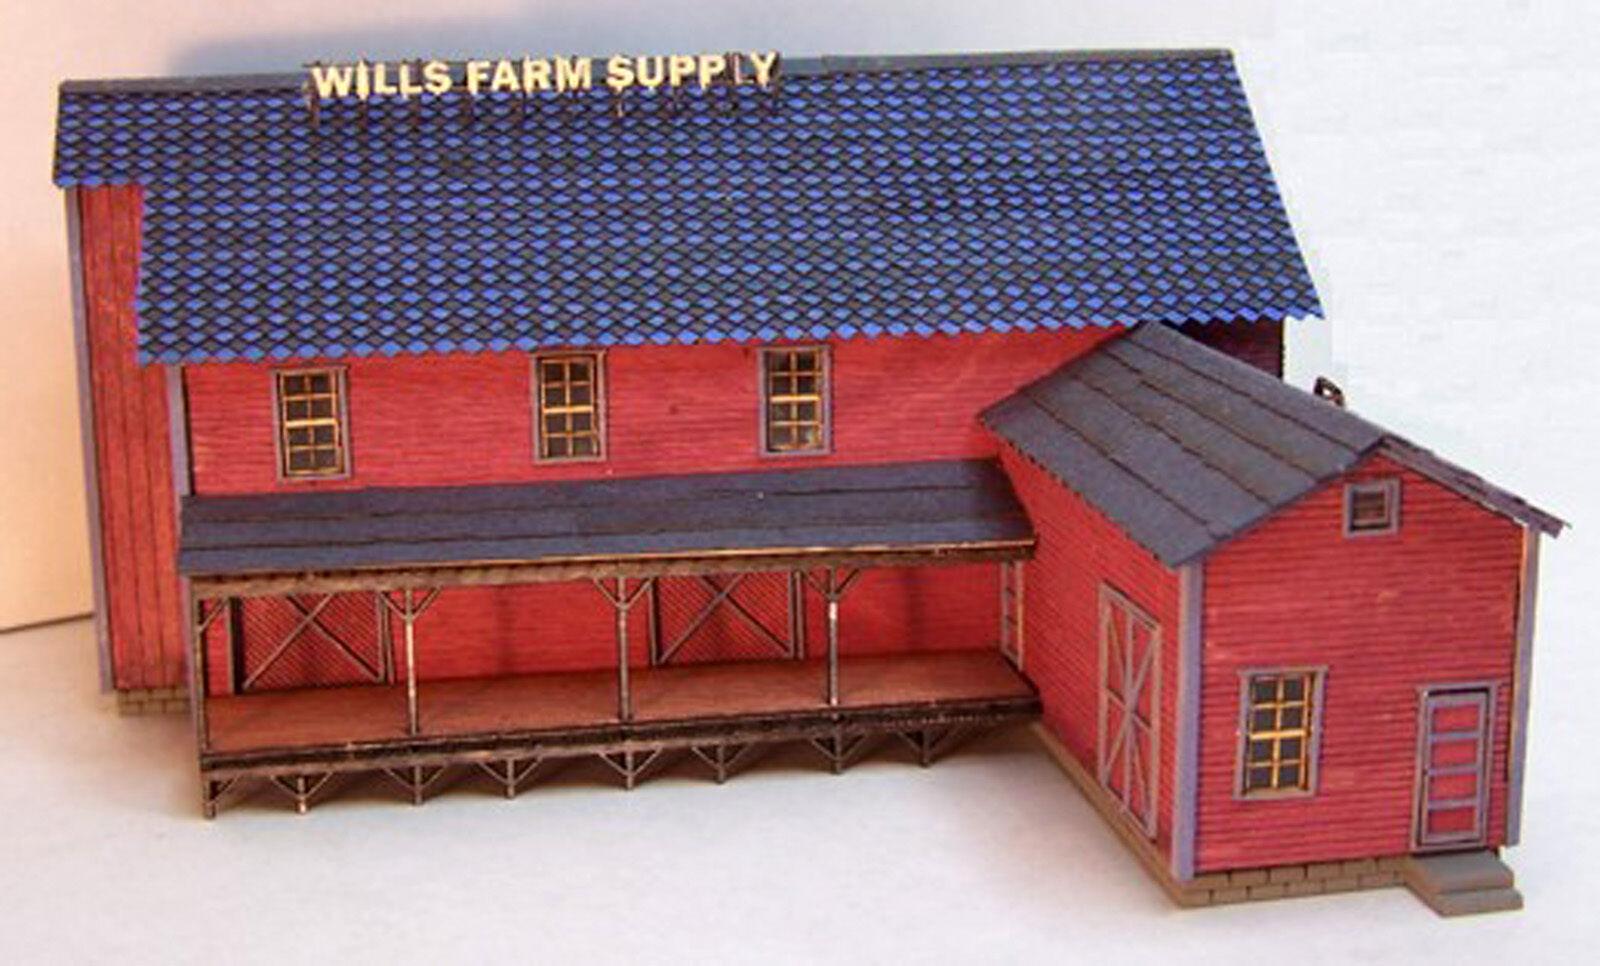 SEED Z Scale modello Railstrada Structure Unptd Wood Laser Kit RSL4008